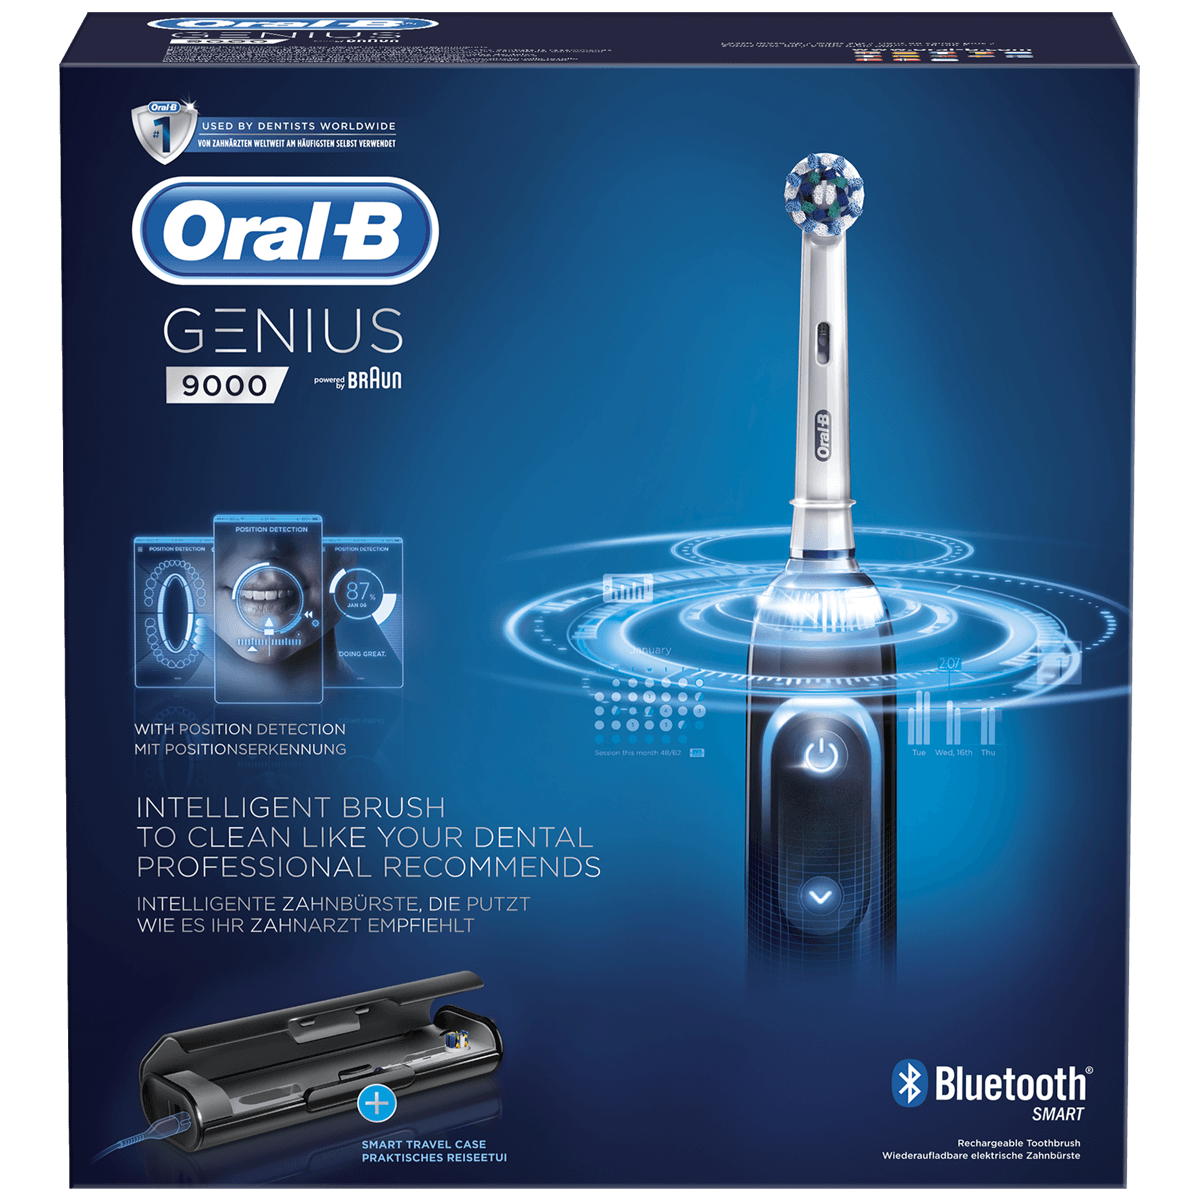 Oral-B Genius 9000 Ηλεκτρική Οδοντόβουρτσα, 3D Κίνηση Βουρτσίσματος & Ανιχνευτής Θέσης για Σωστό Βούρτσισμα σε Όλα τα Σημεία